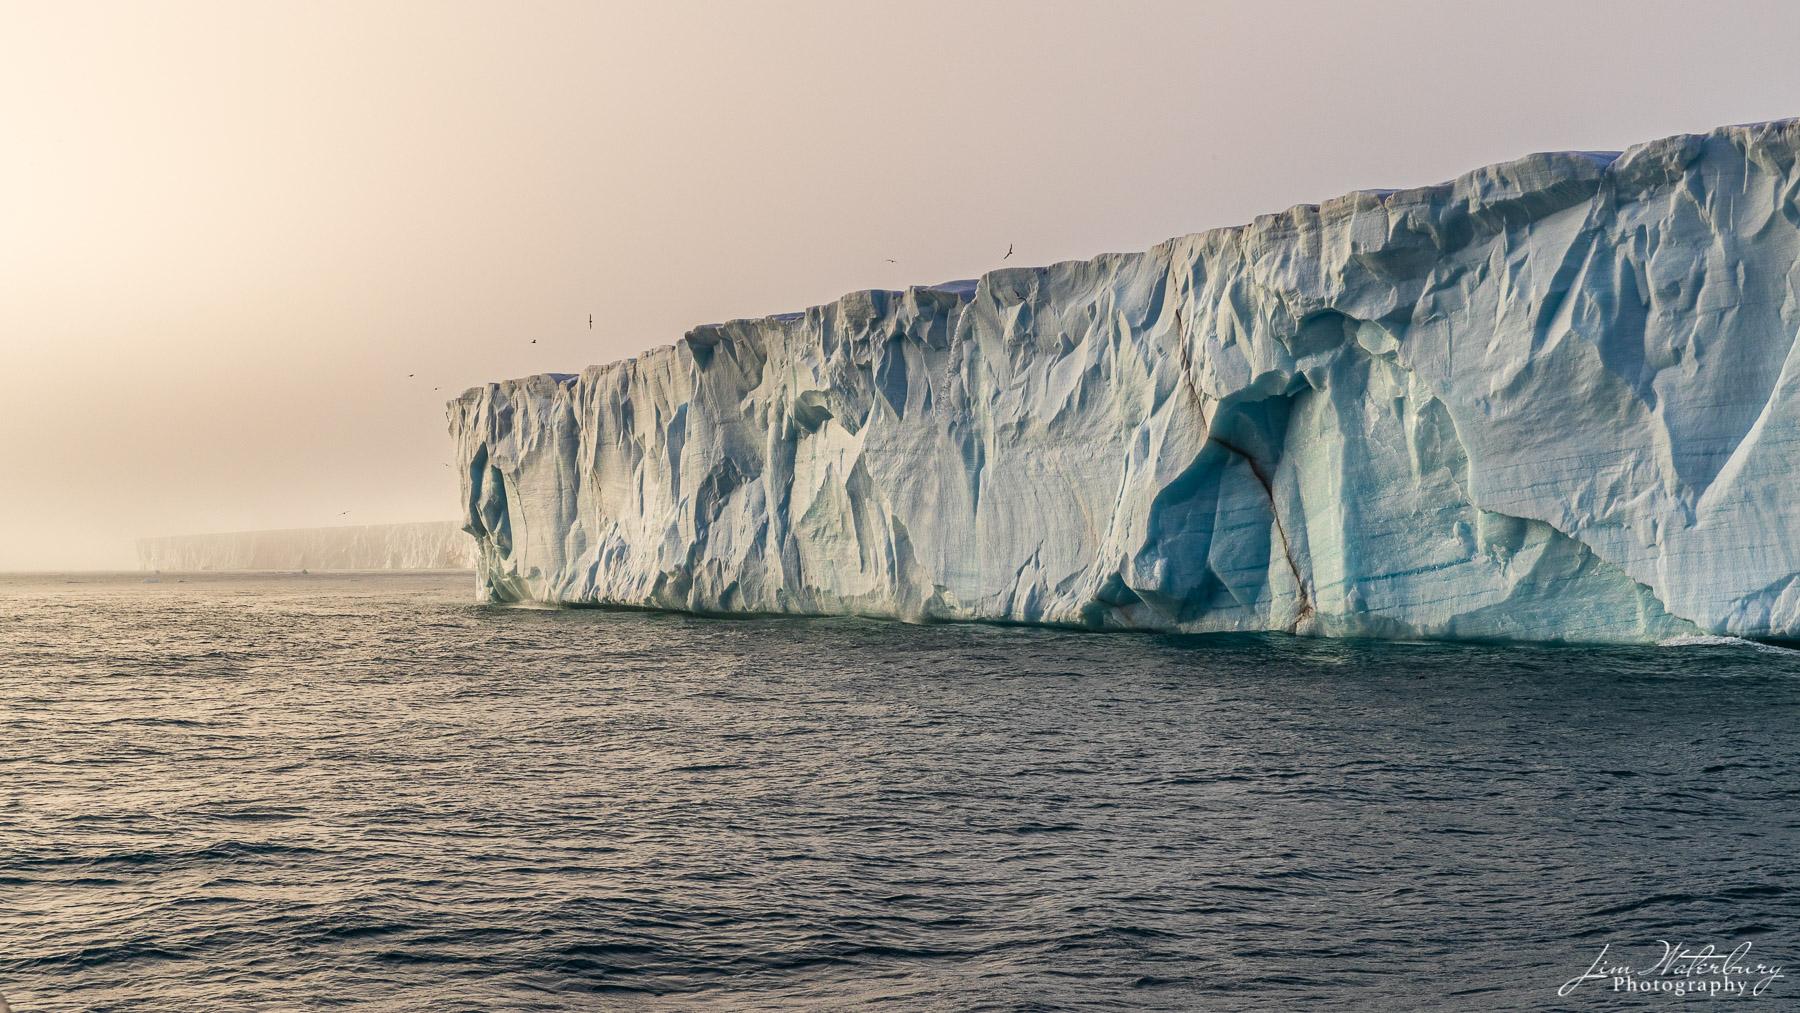 Arctic, Europe, Norway, Svalbard, ice, ice cap, Austfonna, fog, photo